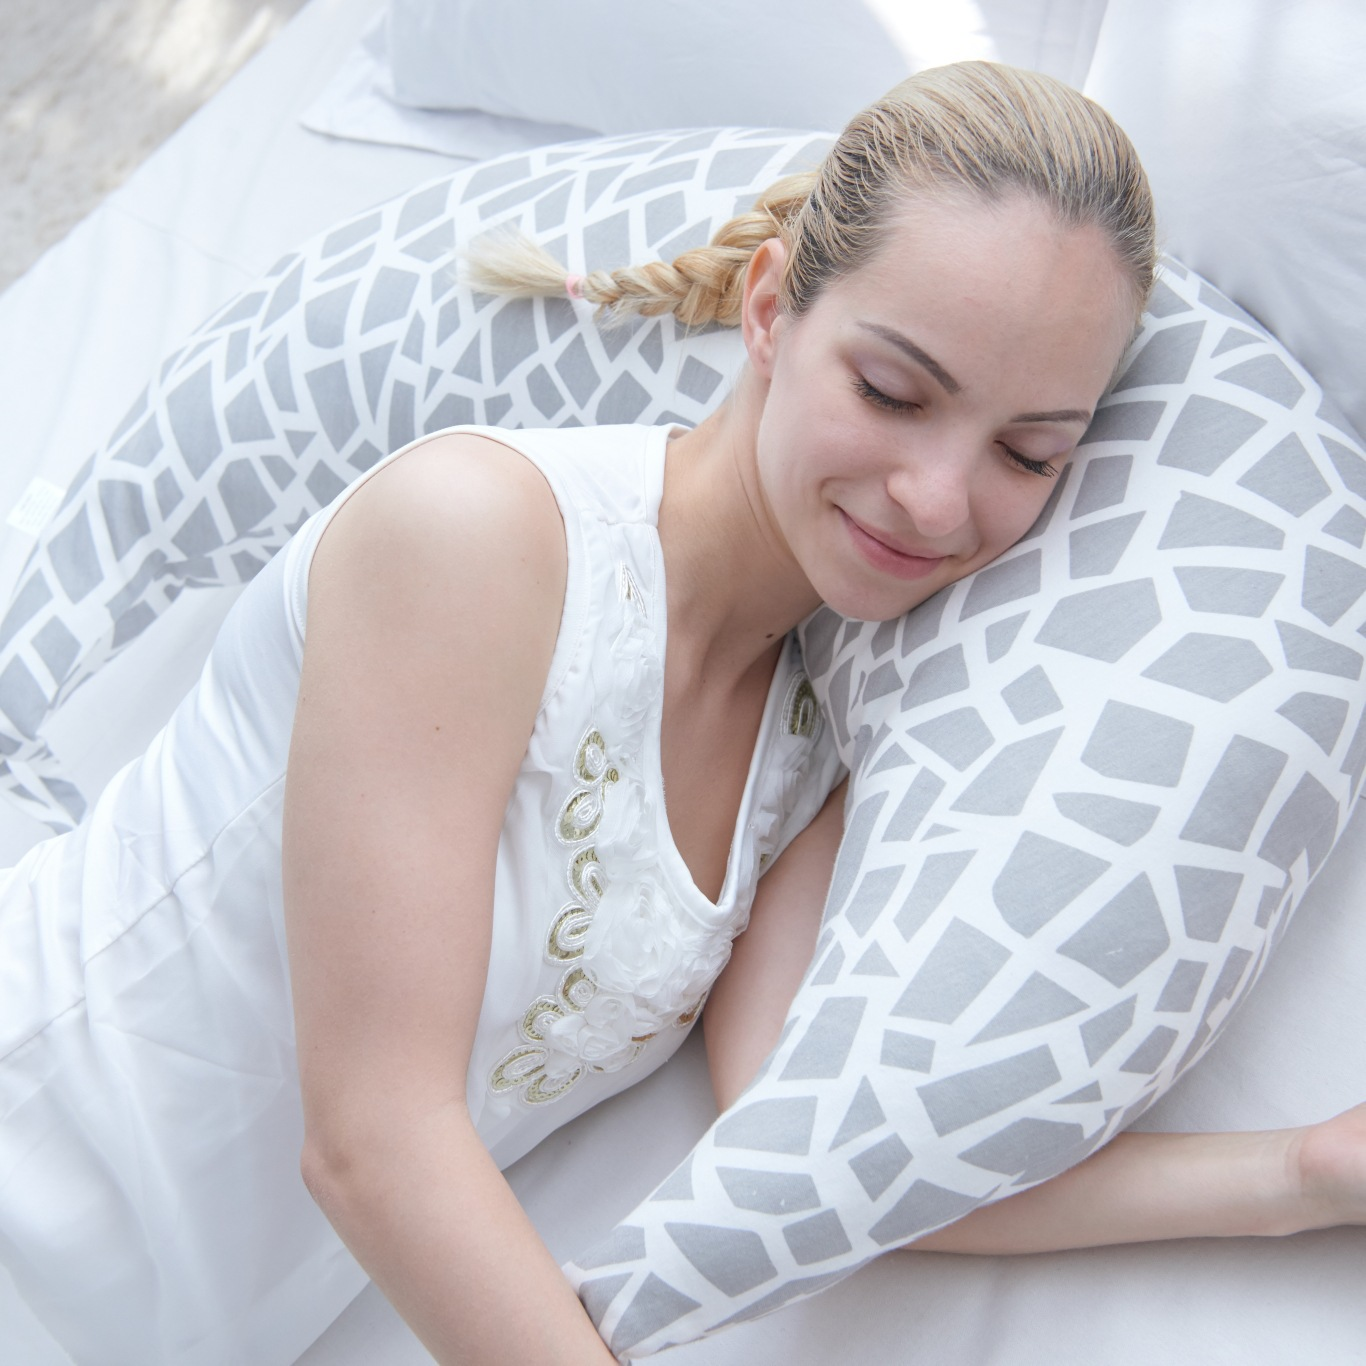 Moon Shape Pillow Baby Multifunction Nursing Pillow Adjust Infant Breastfeeding Pillow Baby Protect Mummy Waist Support Cushion цена